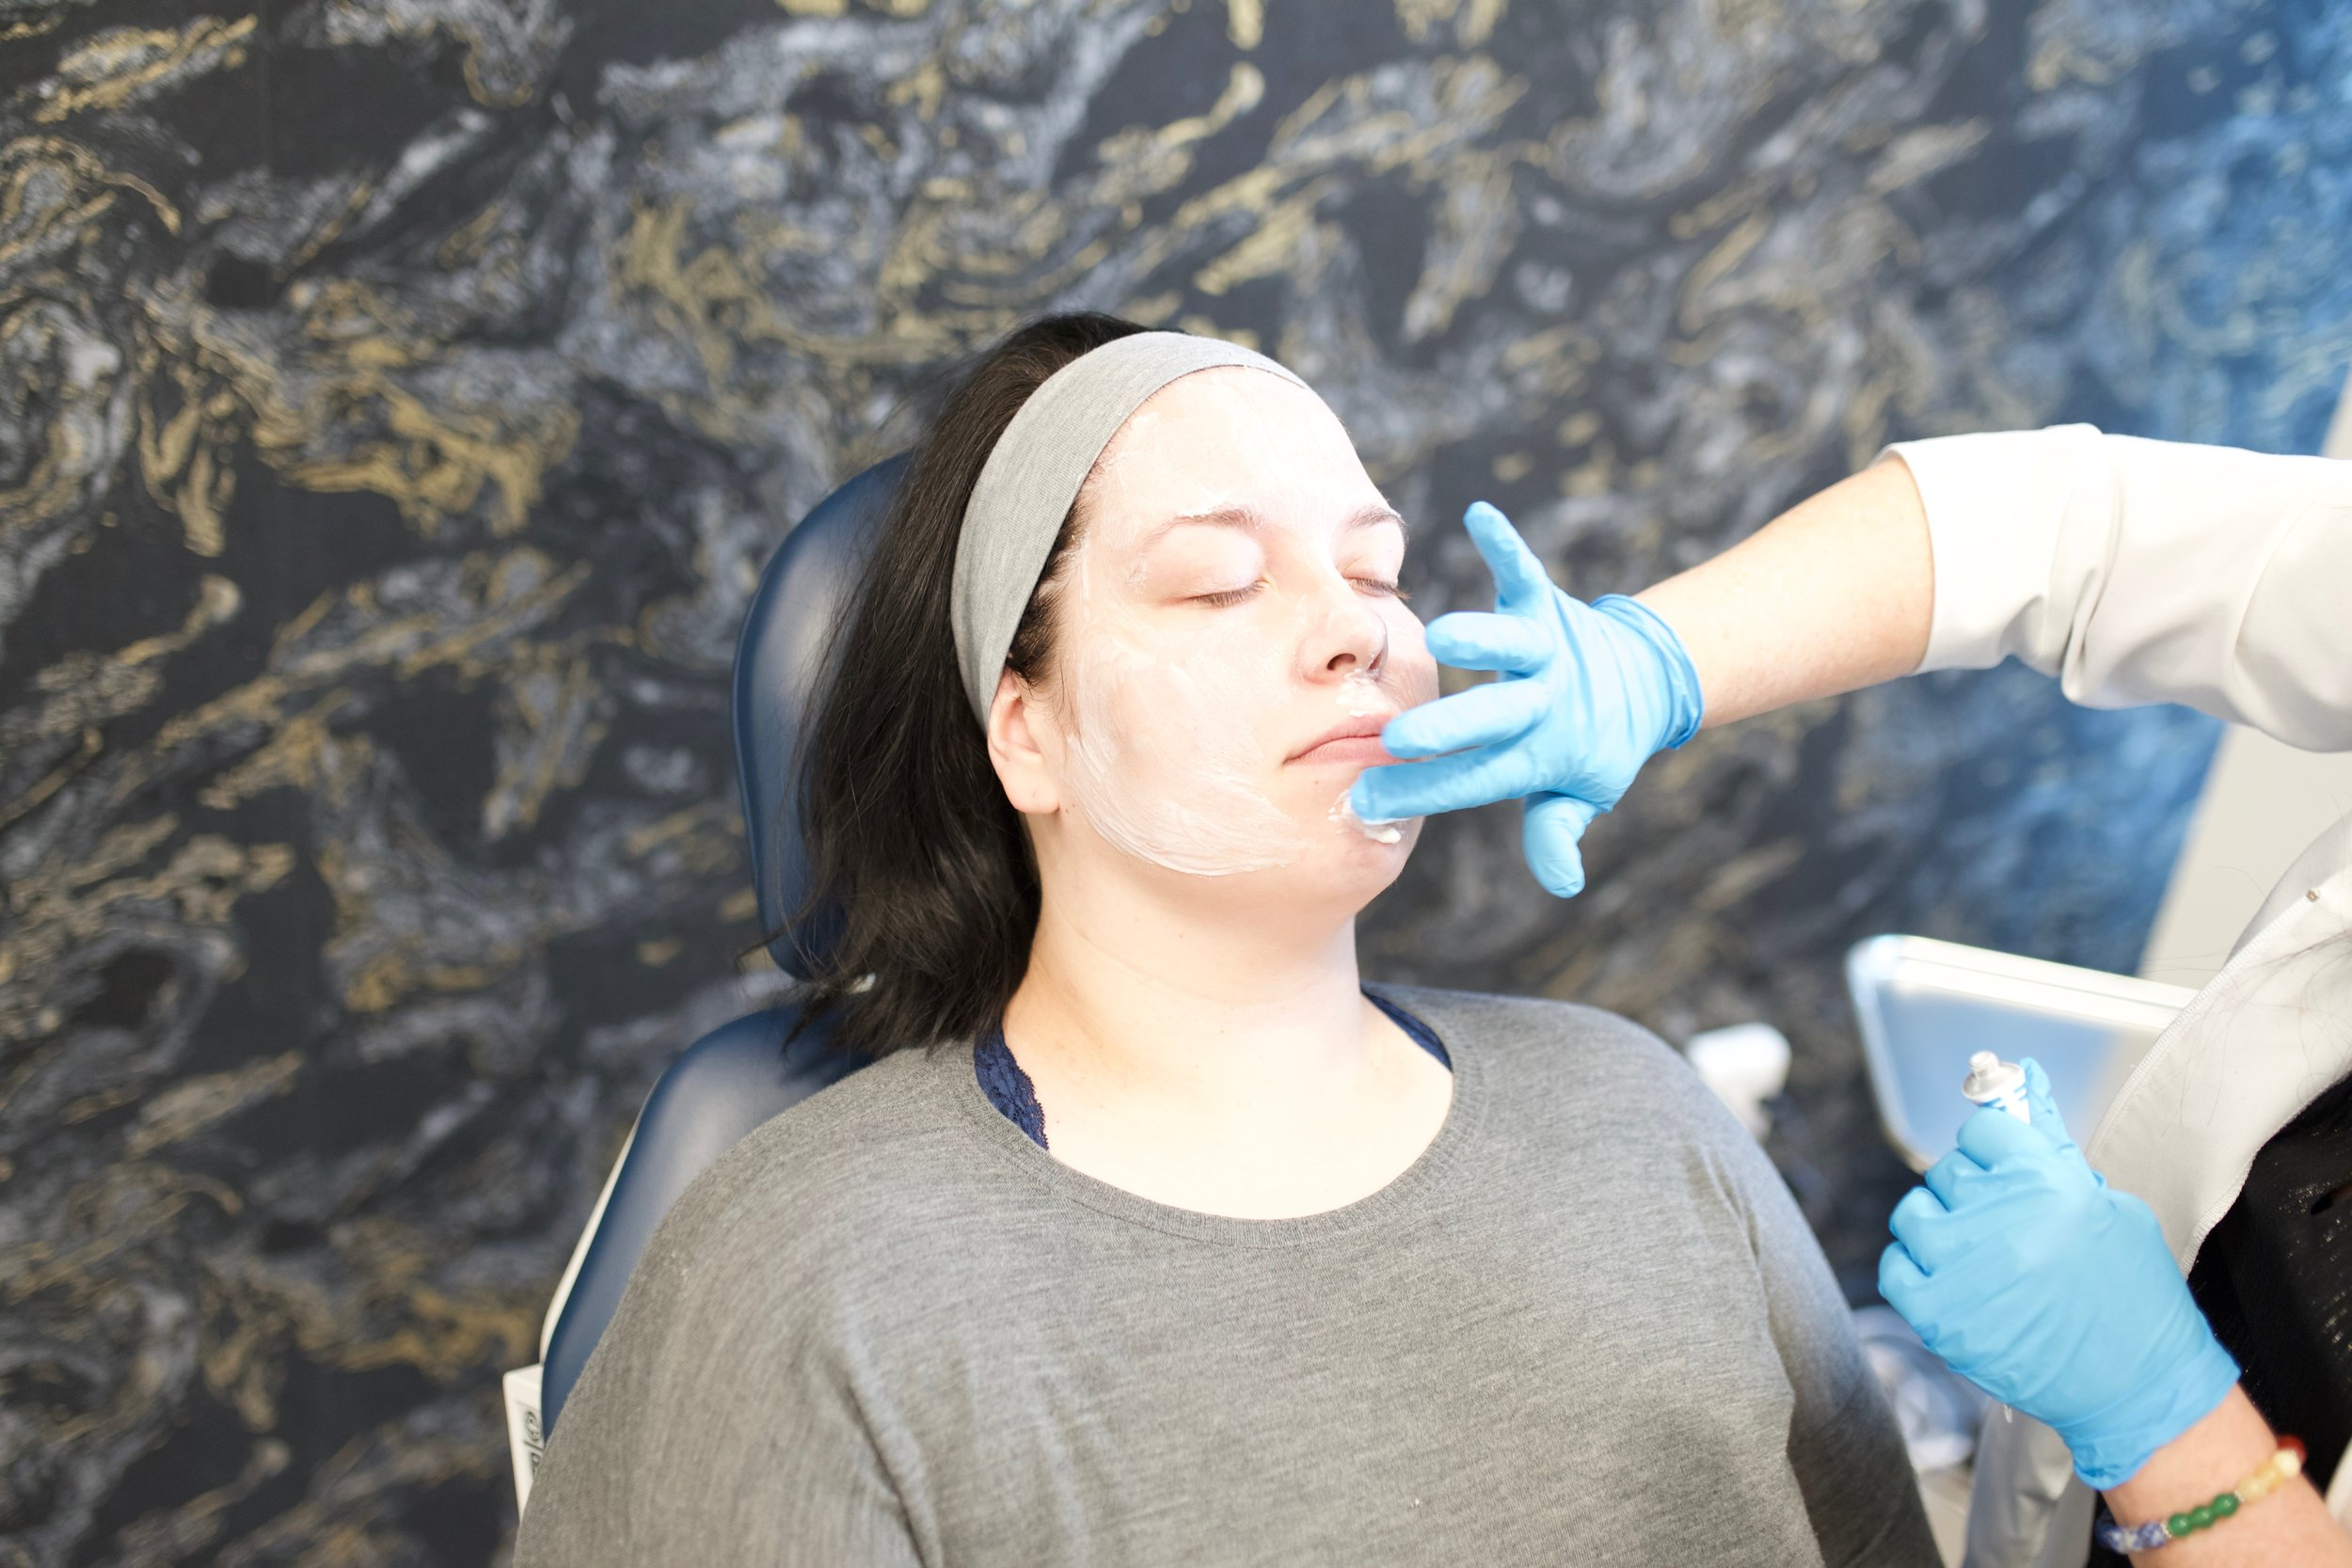 Numbing cream application